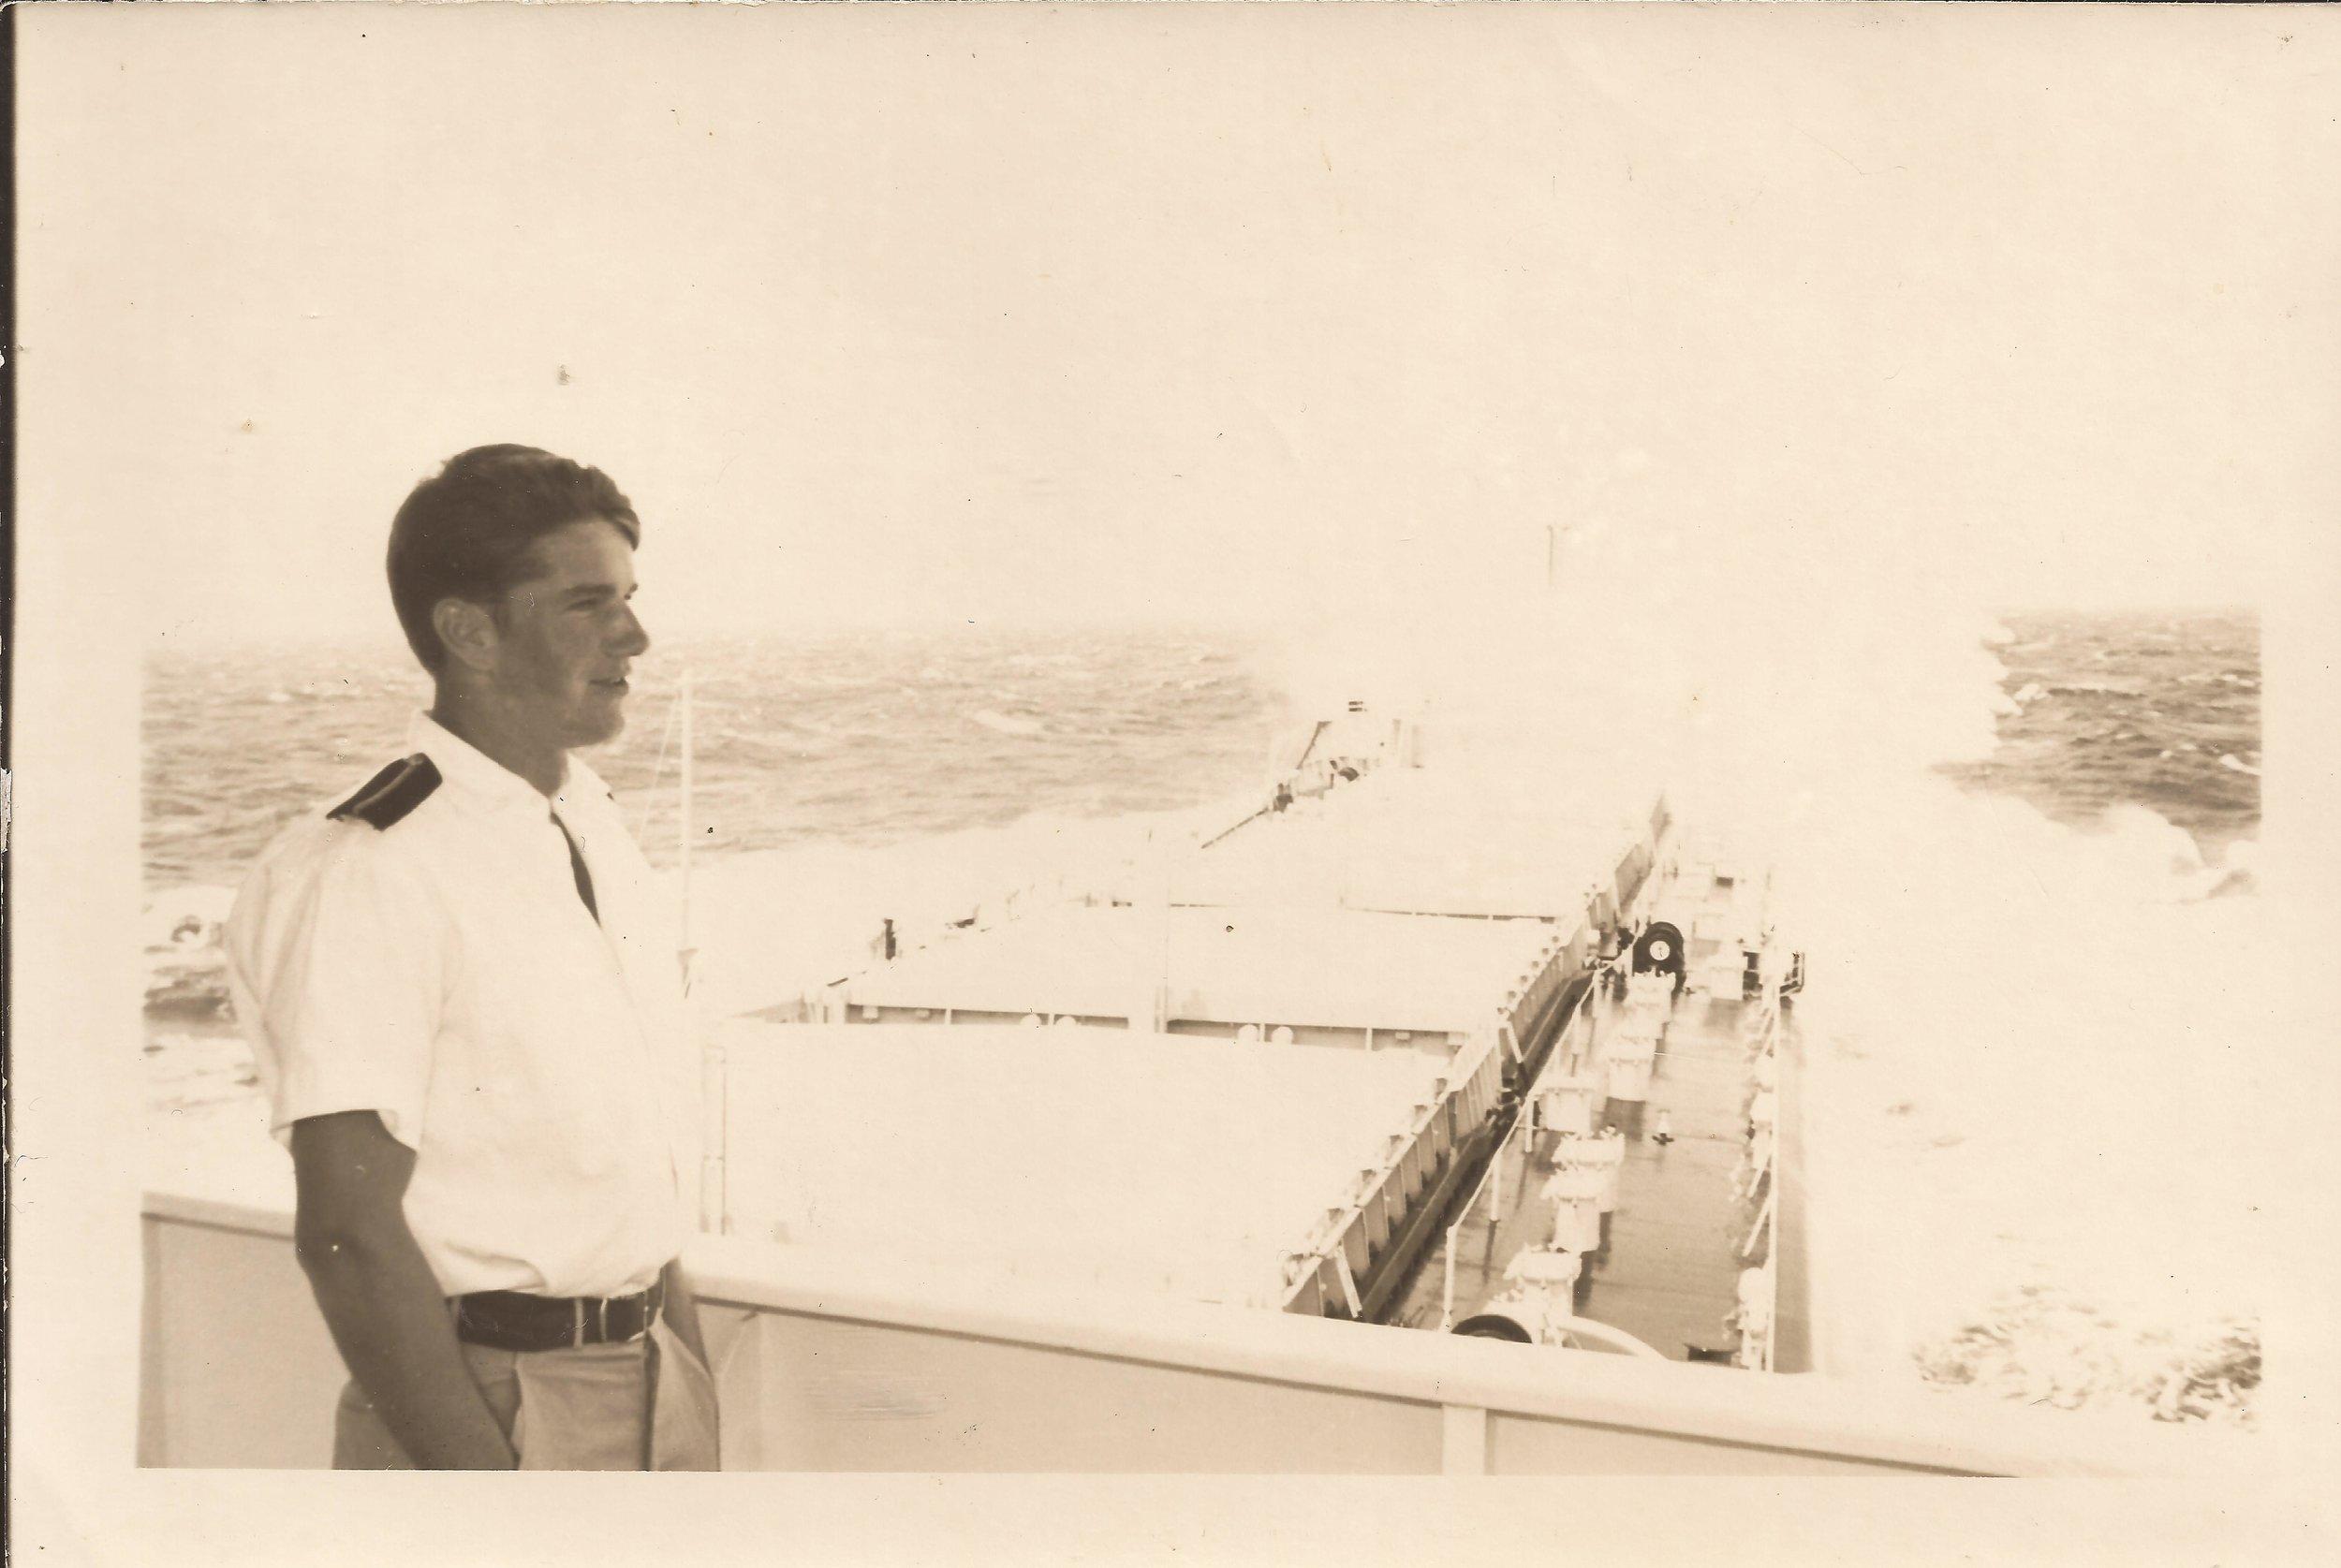 Iain Morrison as a young member of the Merchant Navy. Photo: Turus Mara